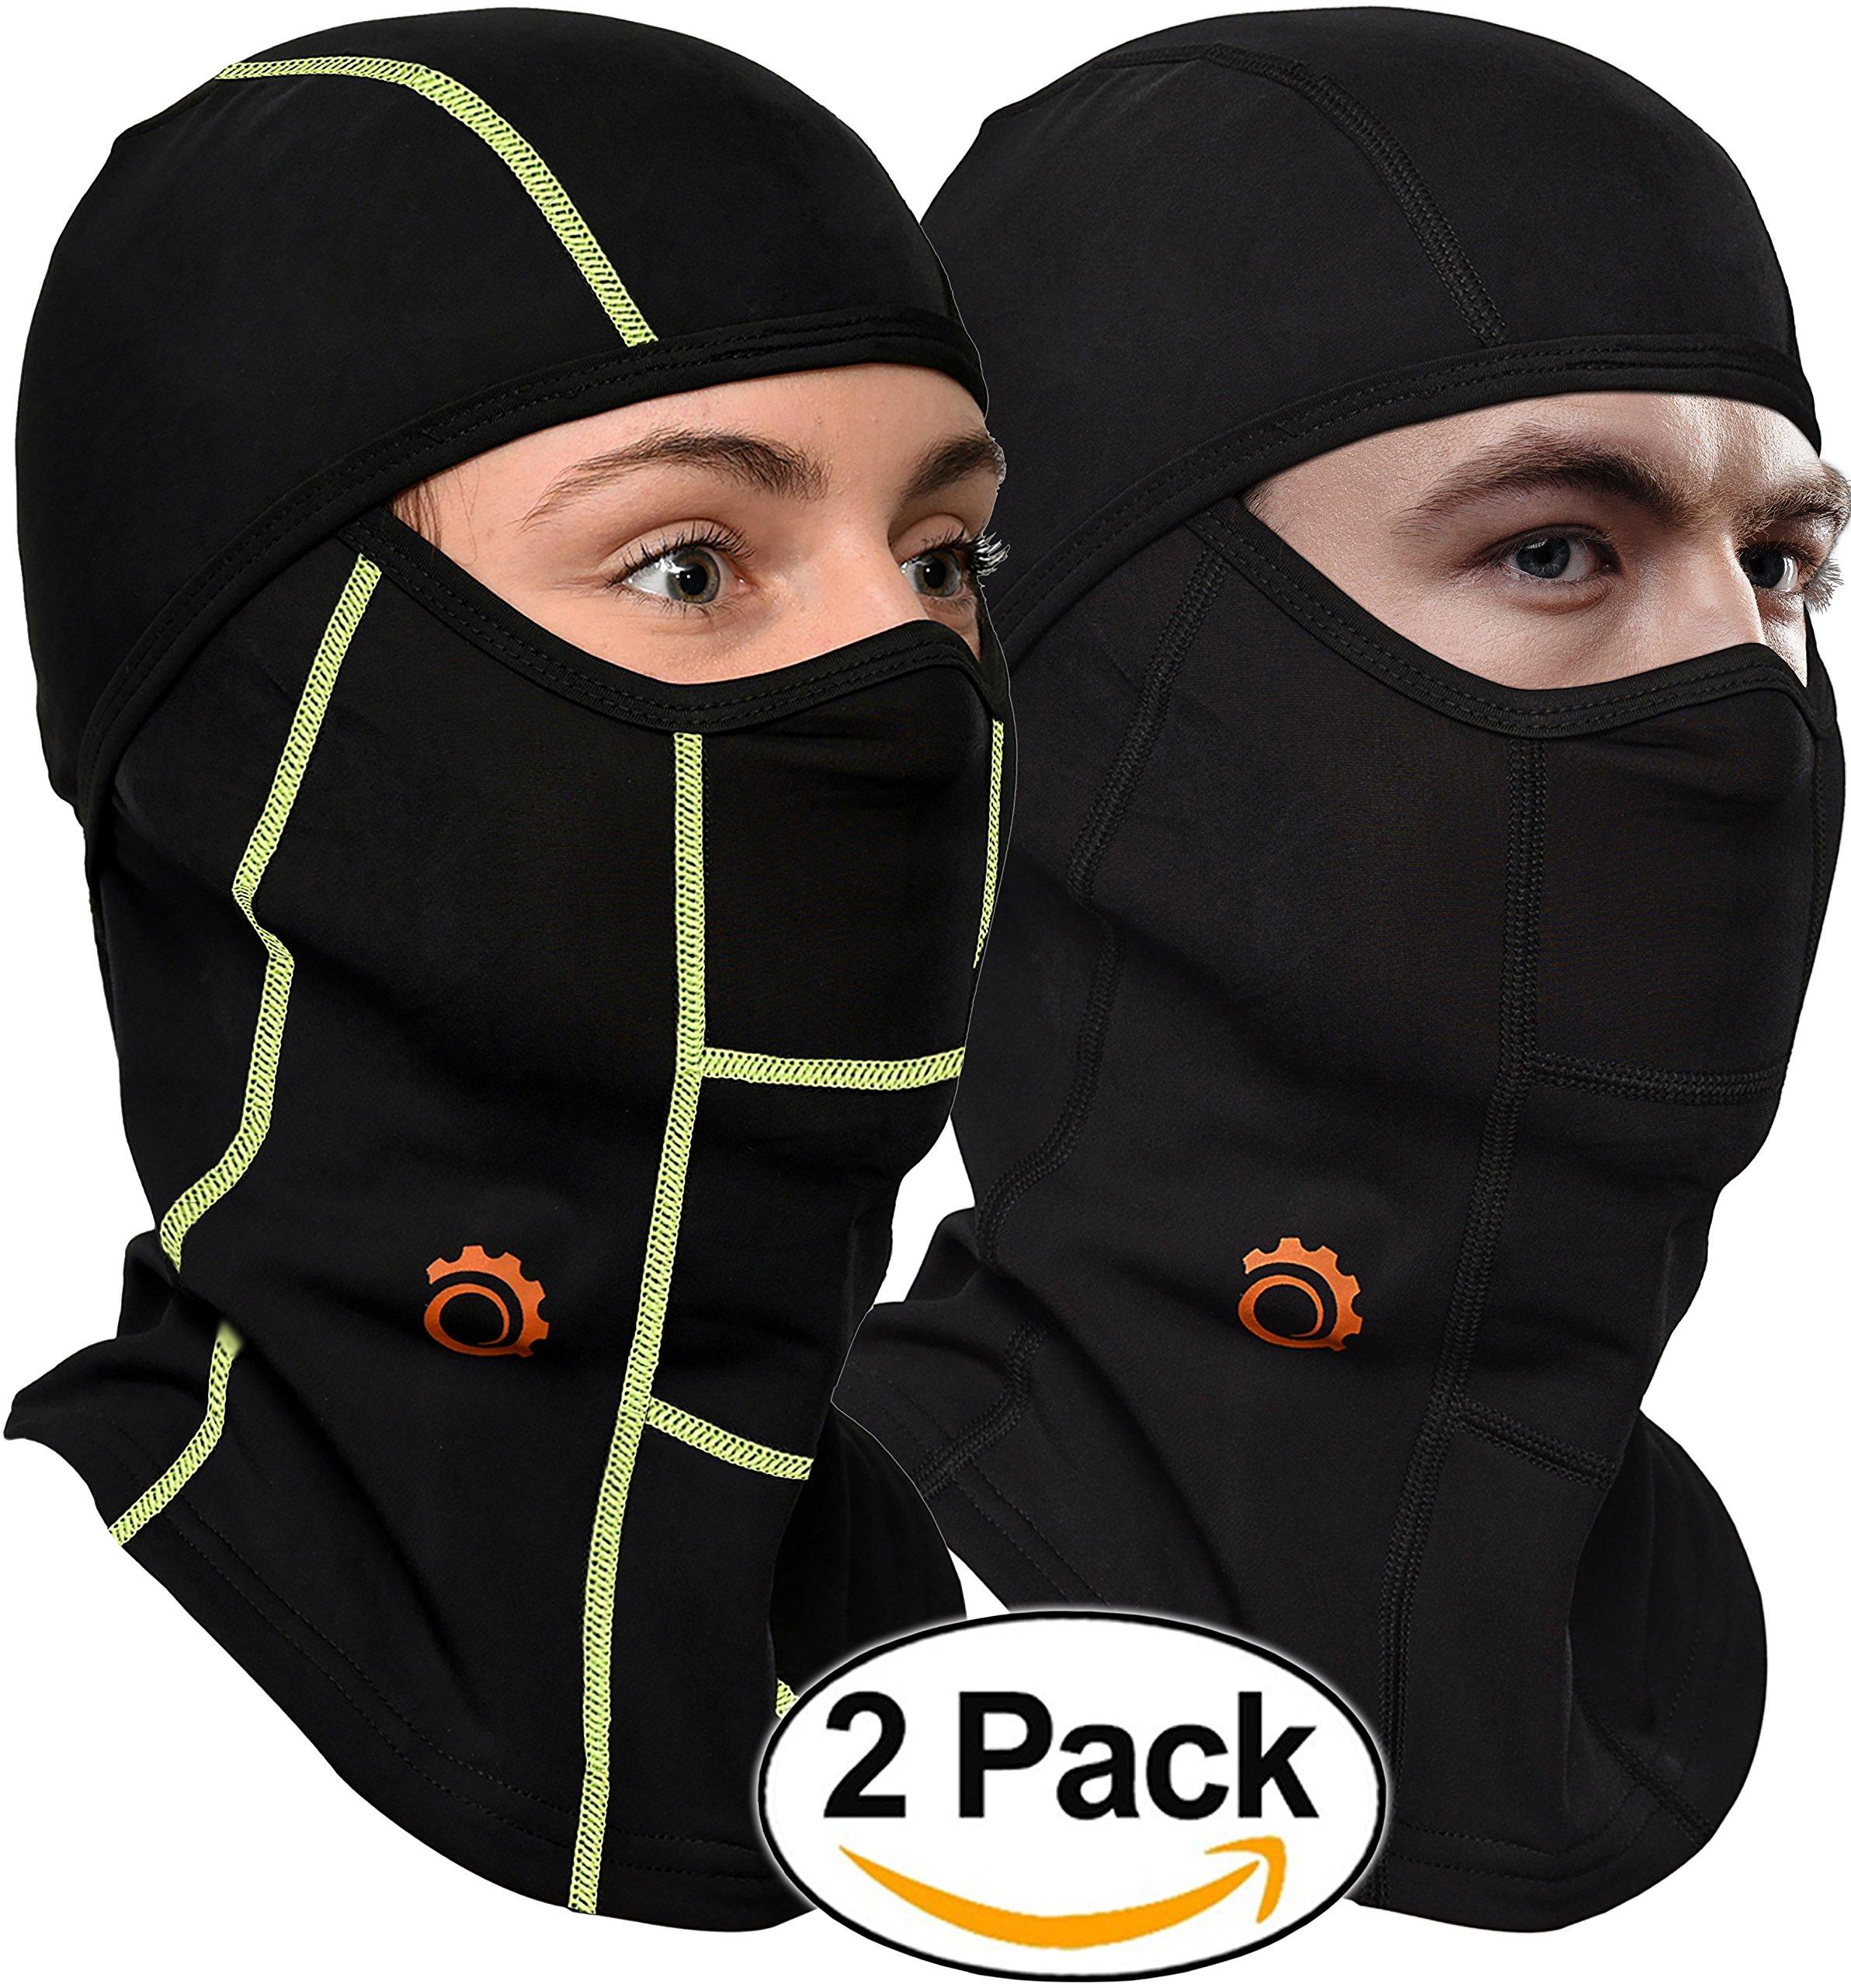 Face Mask Motorcycle Balaclava (Black/Green + Black - 2 Pack)